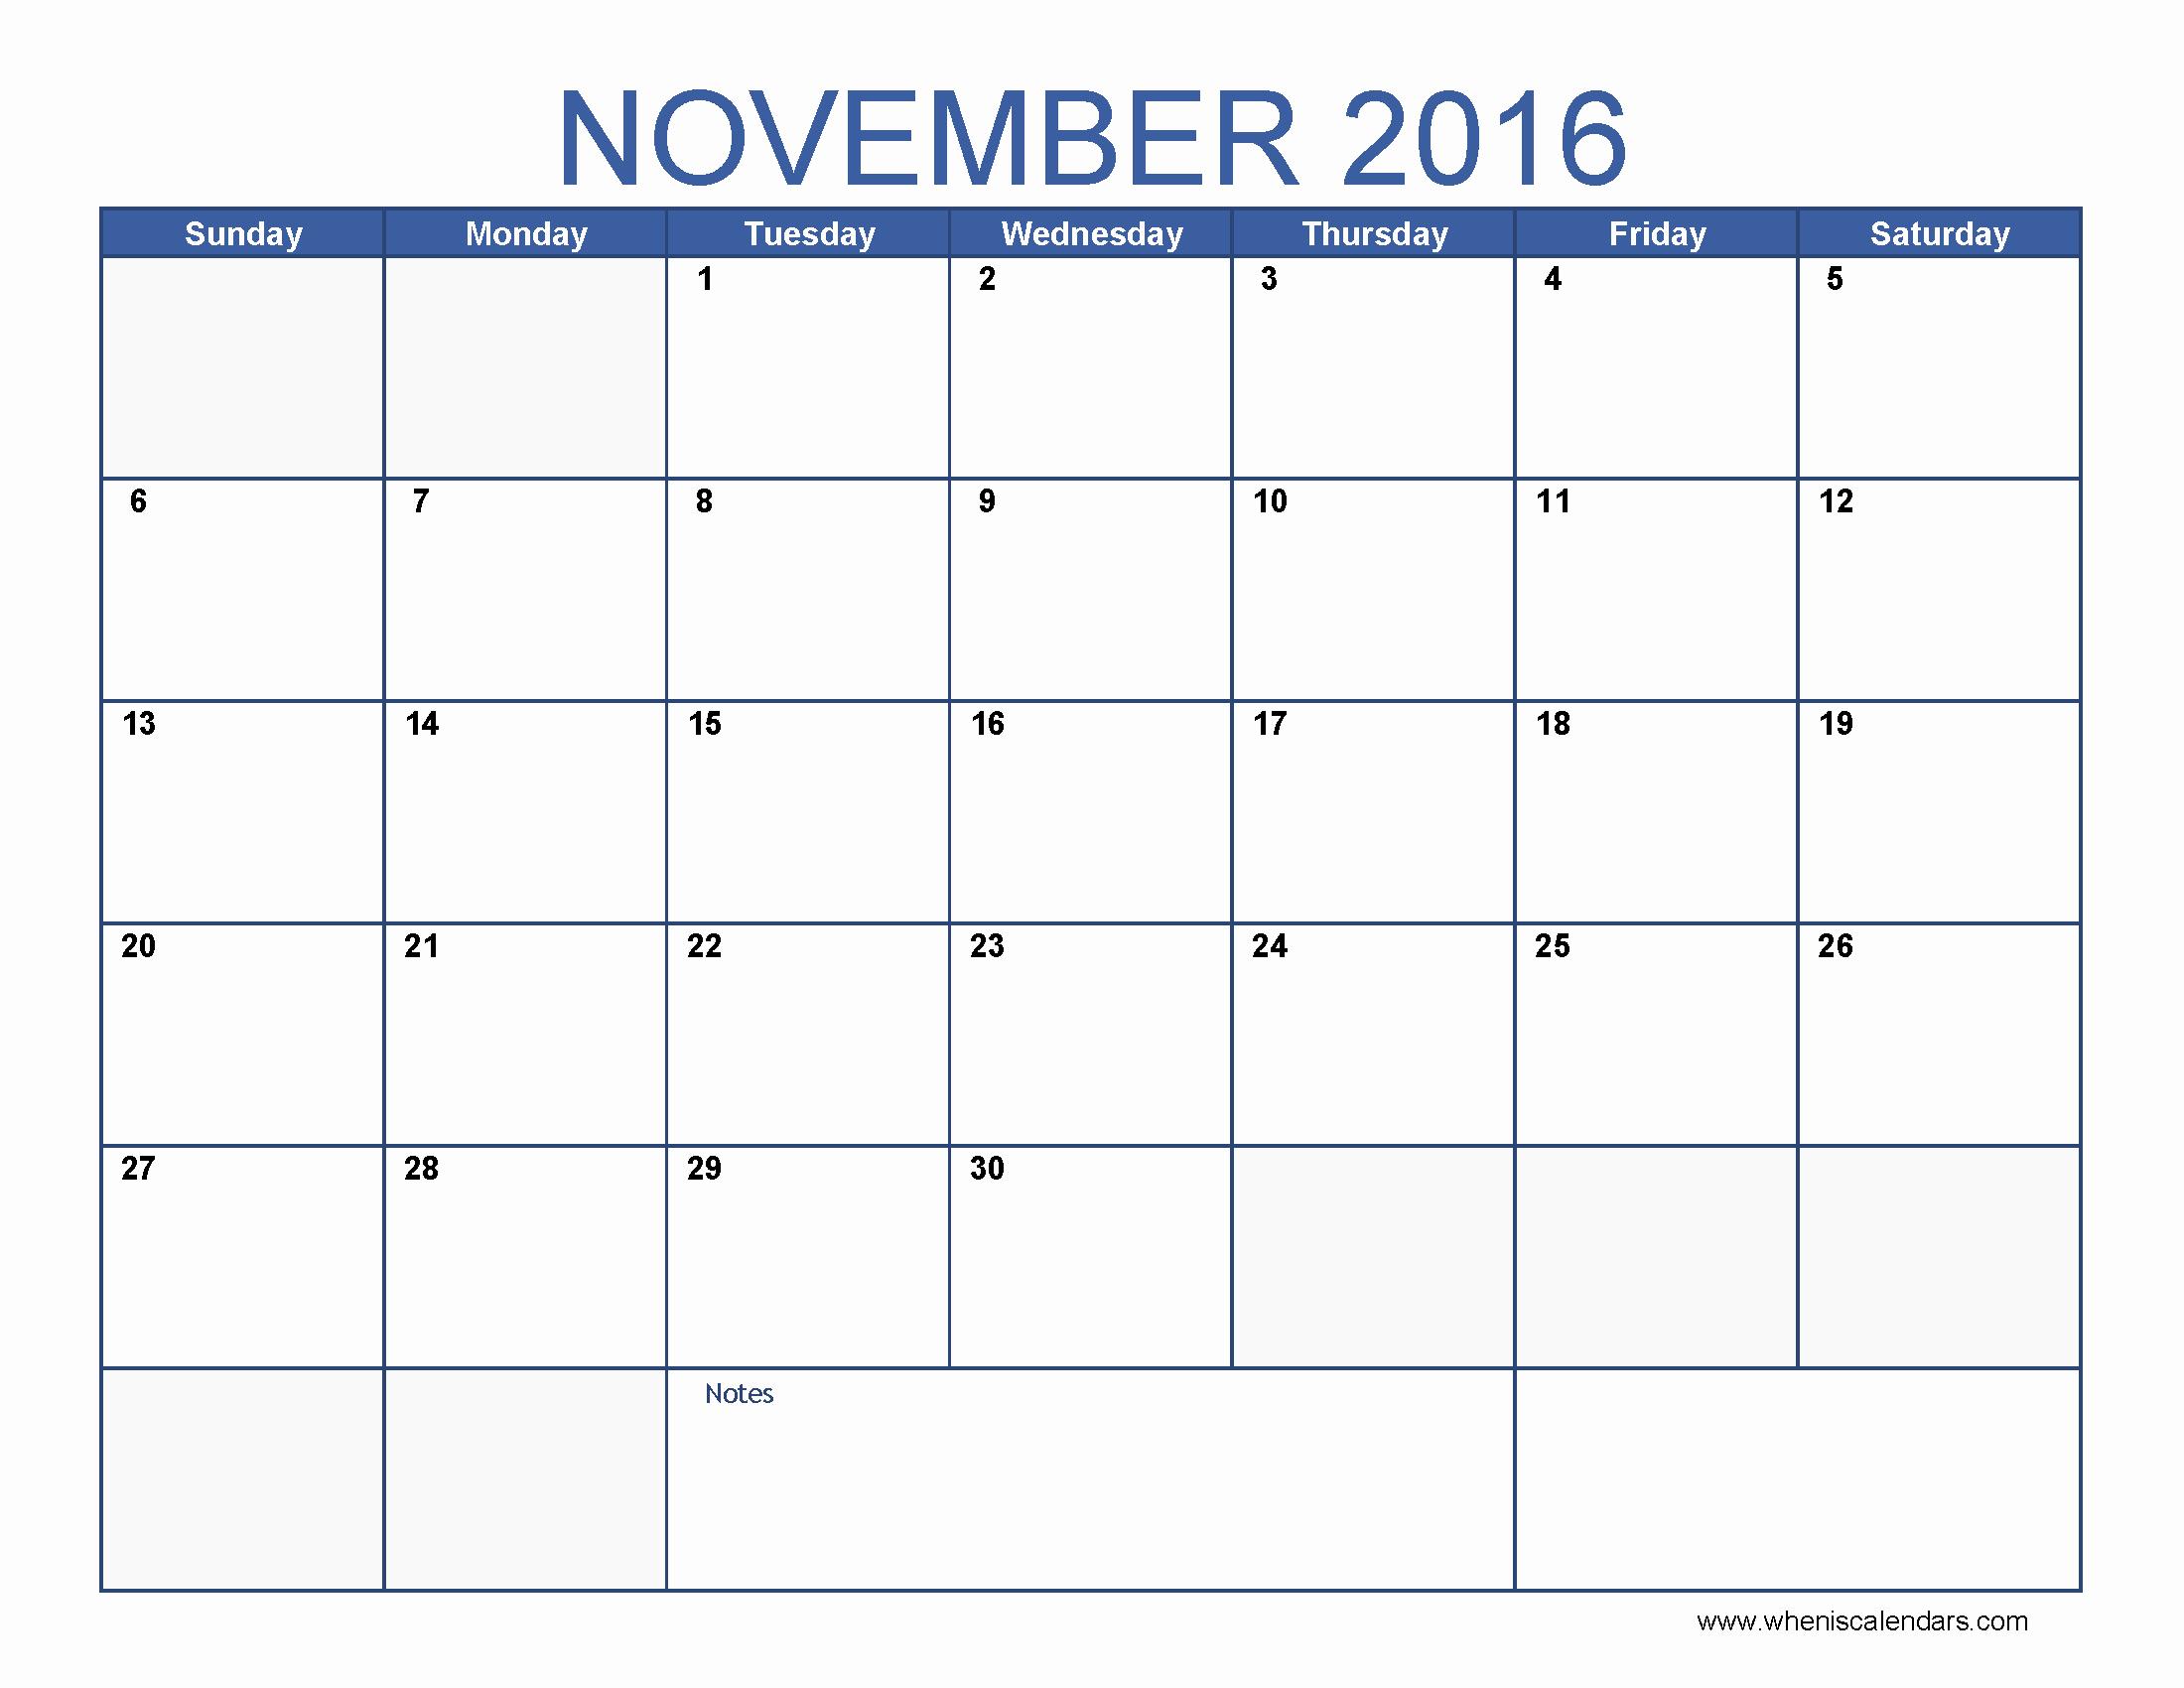 2016 Calendar Excel with Holidays Beautiful November 2016 Calendar Excel – Templates Free Printable